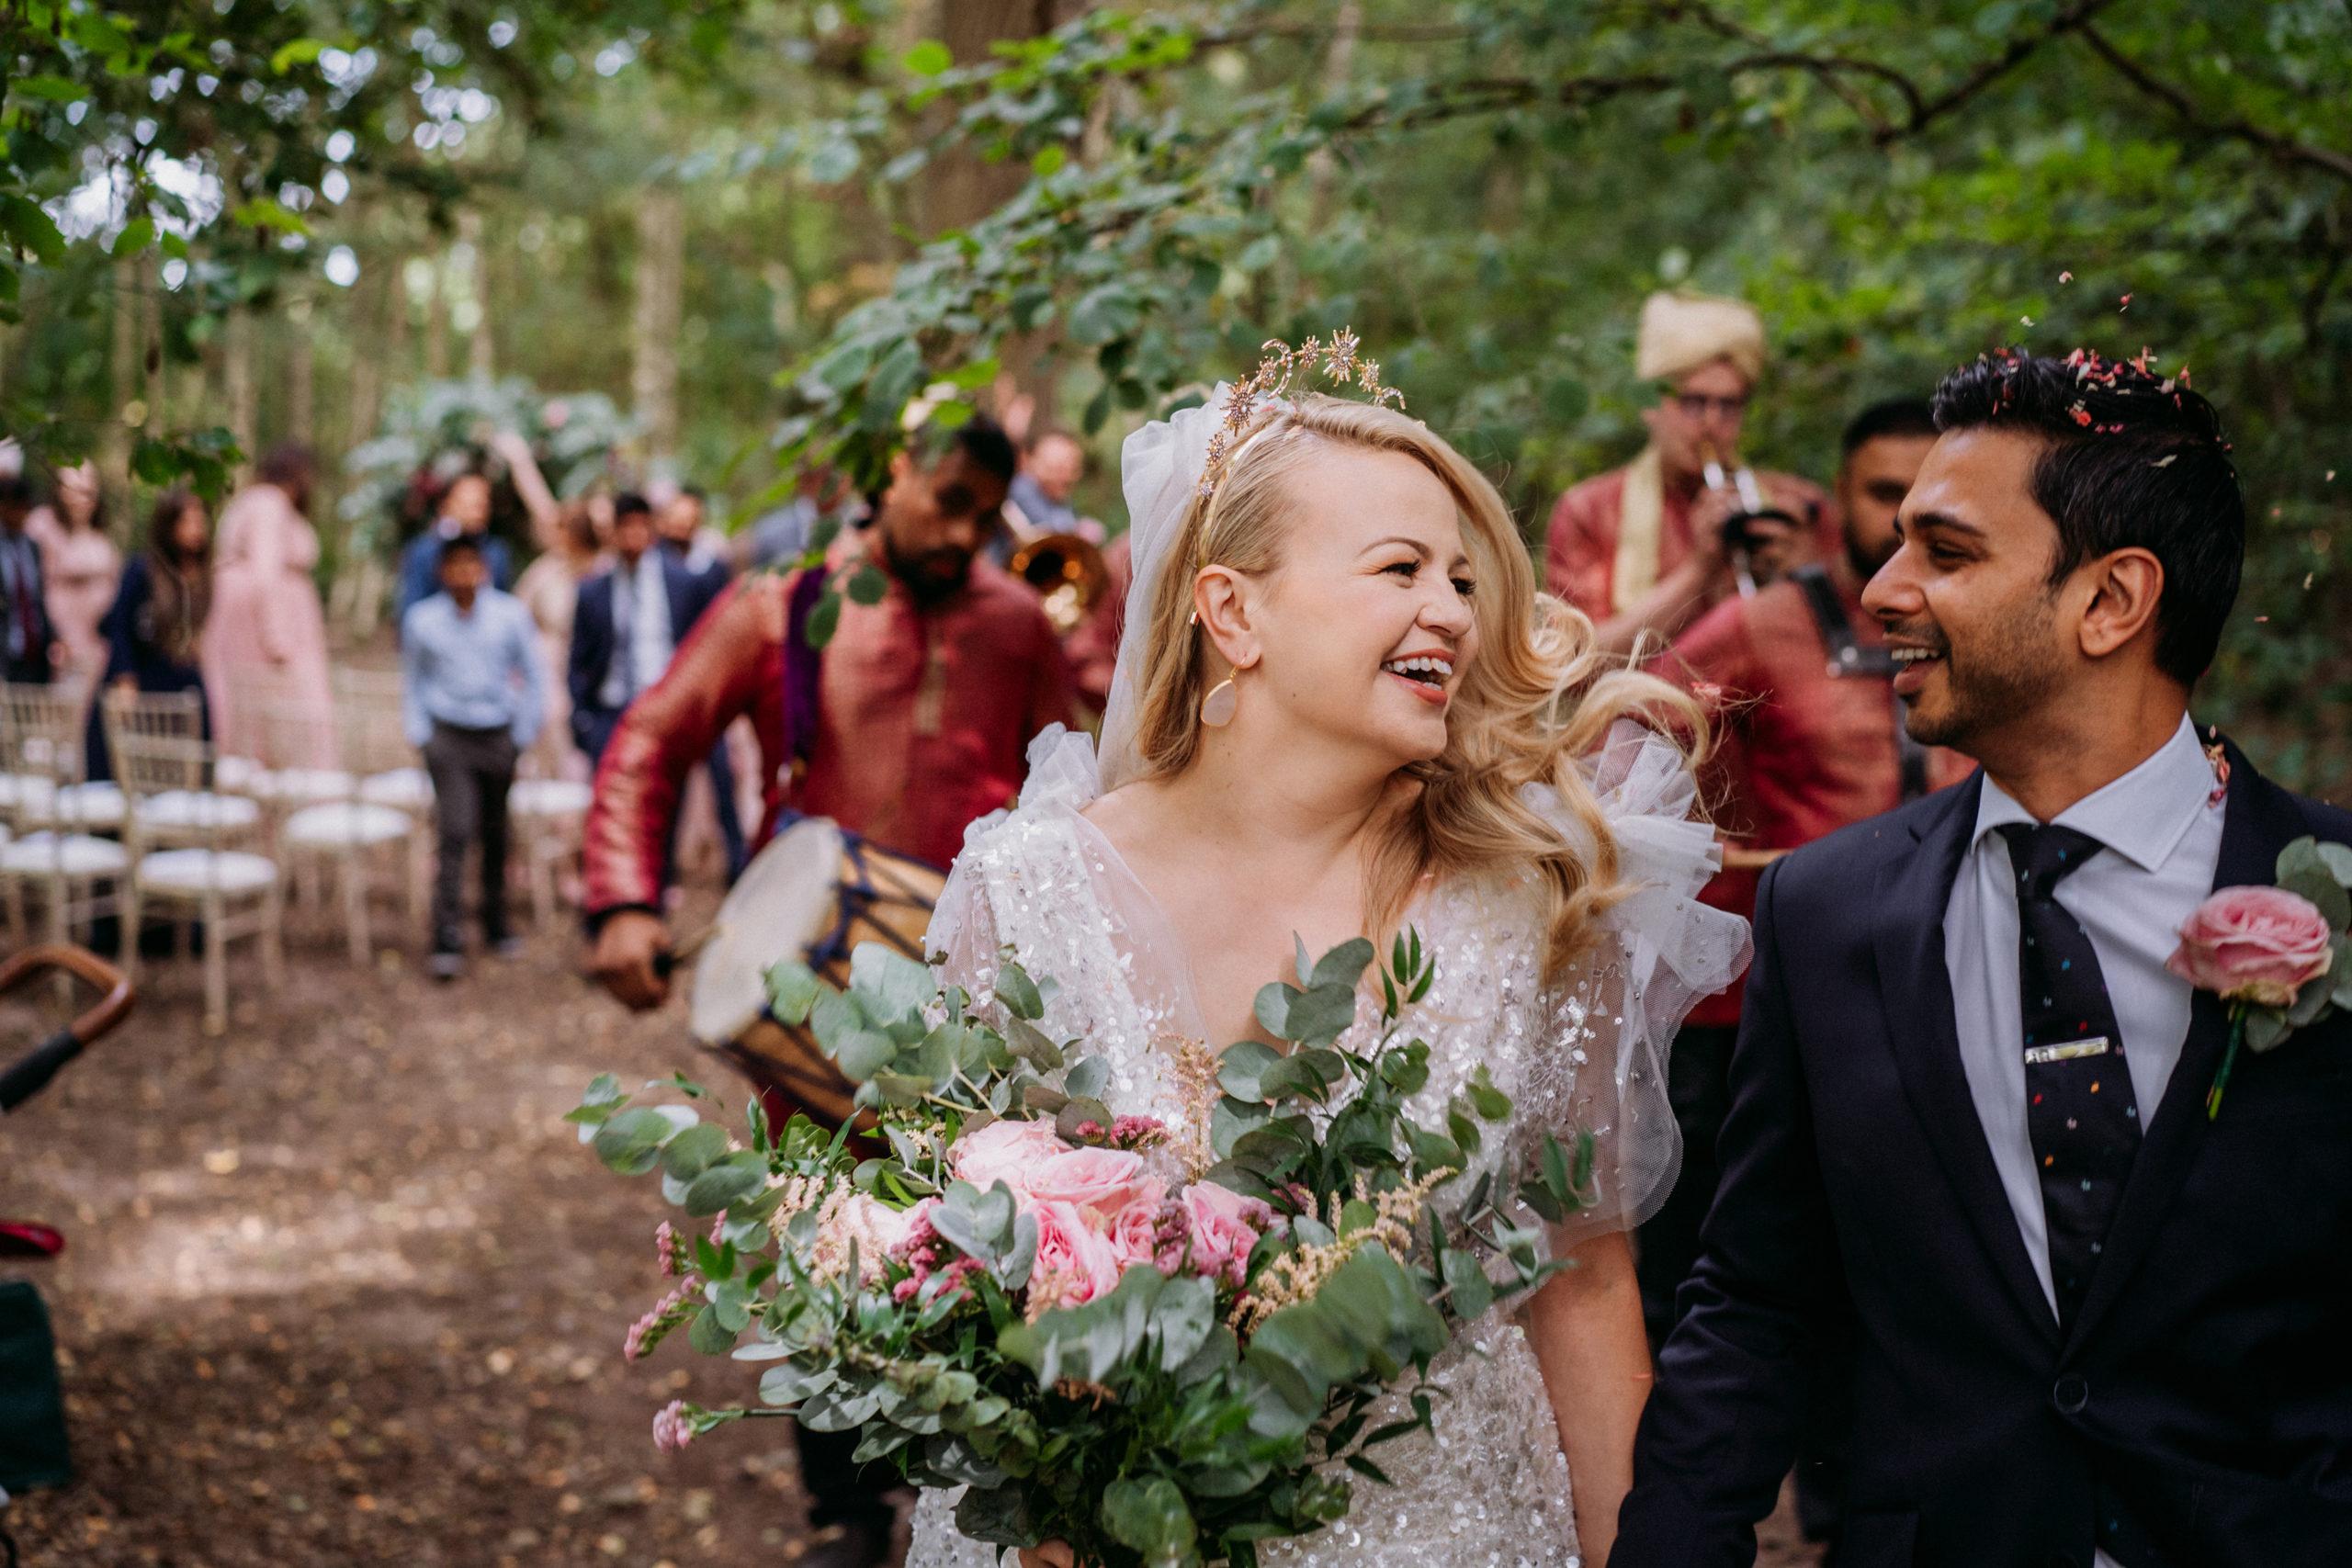 festival tipi wedding photography lex fleming photo